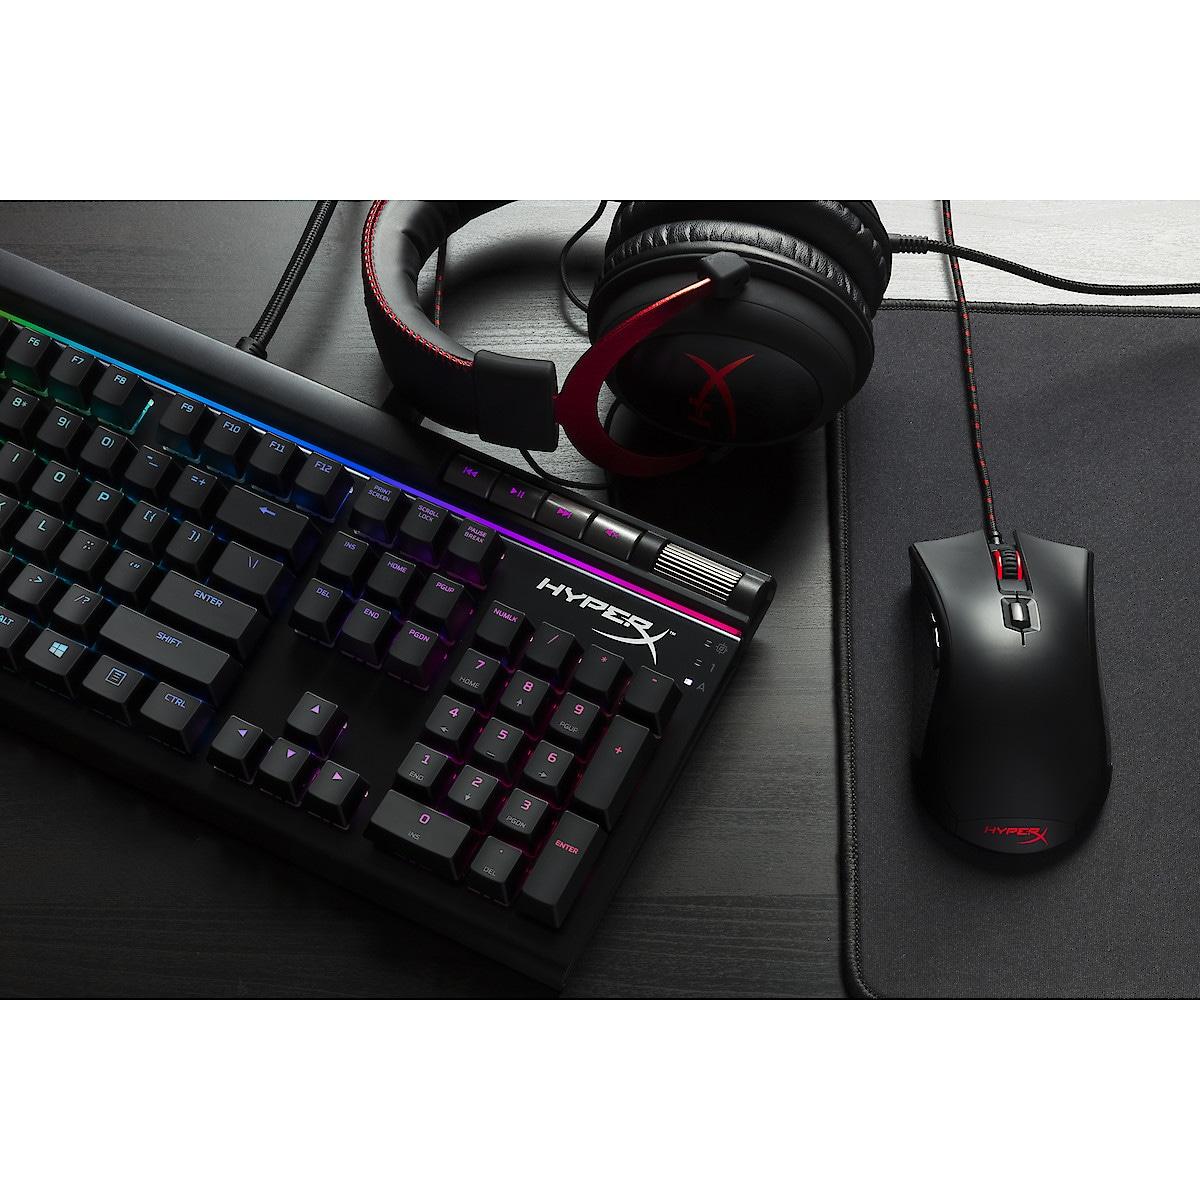 HyperX Pulsefire FPS Pro gamingmus